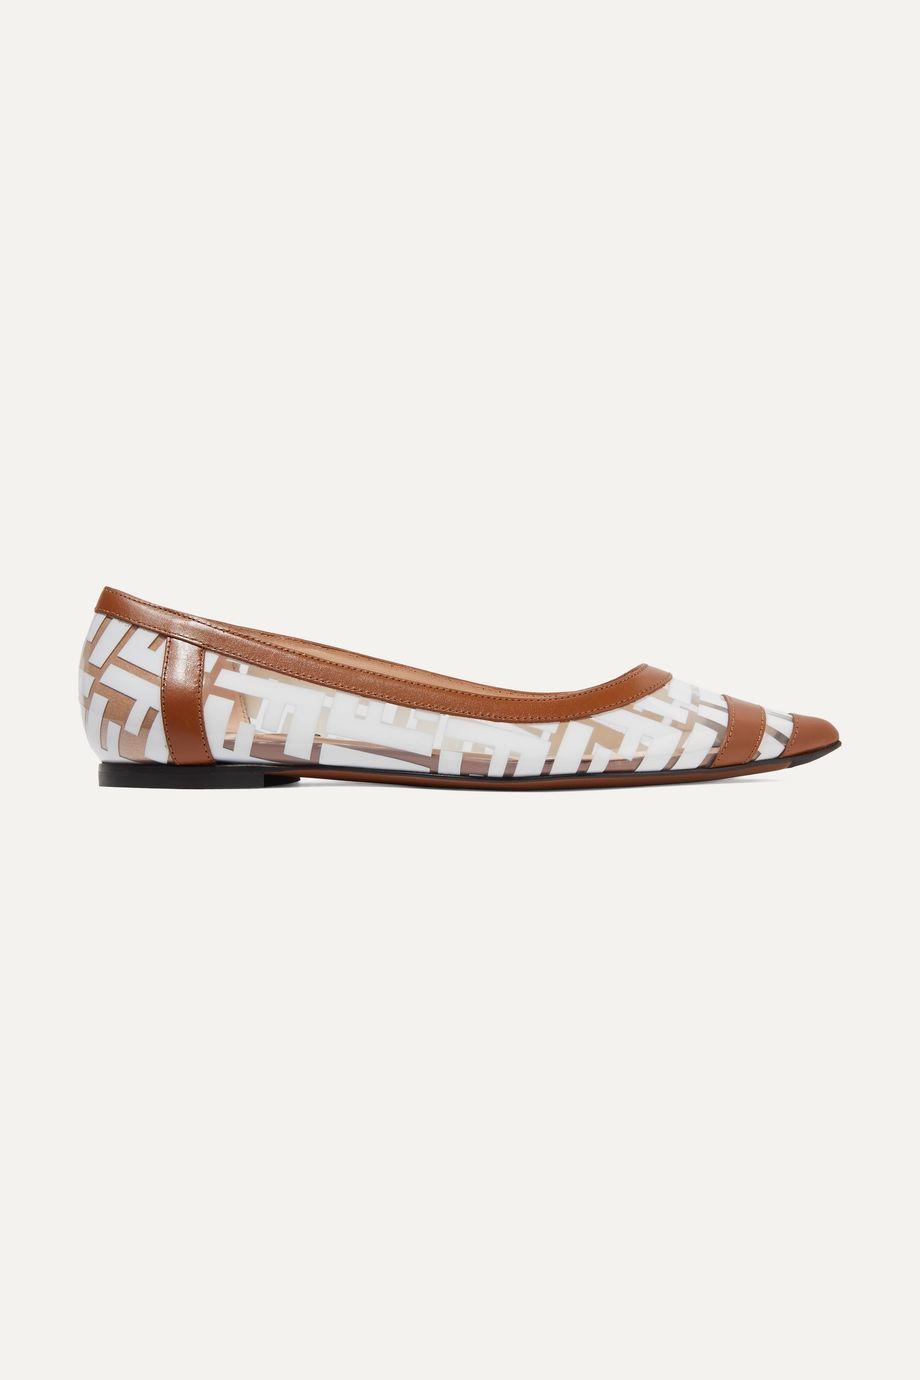 Fendi Colibri 皮革边饰标志印花 PVC 尖头平底鞋